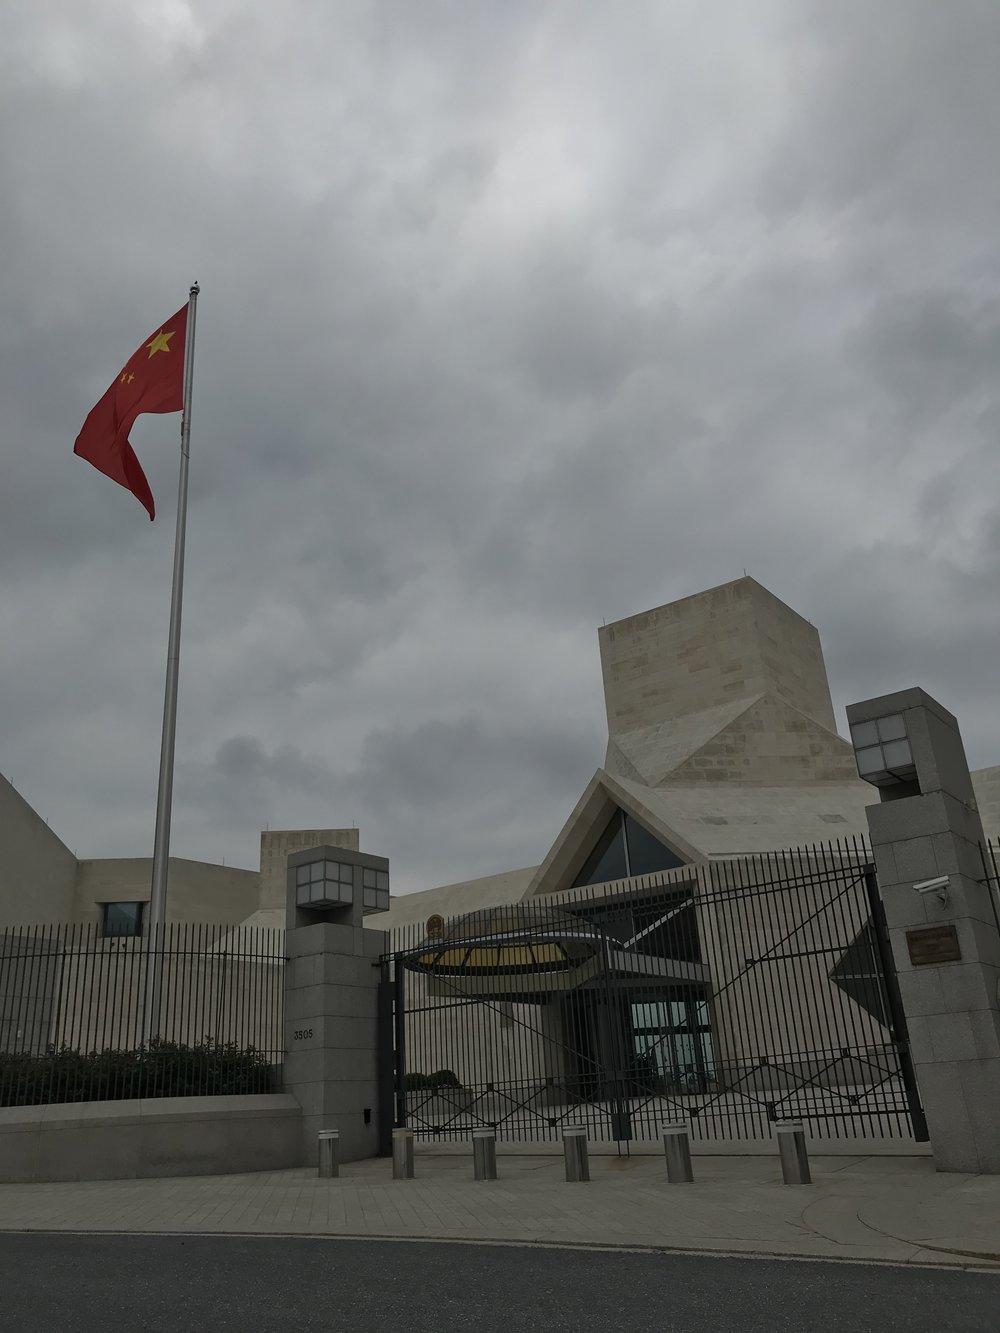 The Embassy of China.